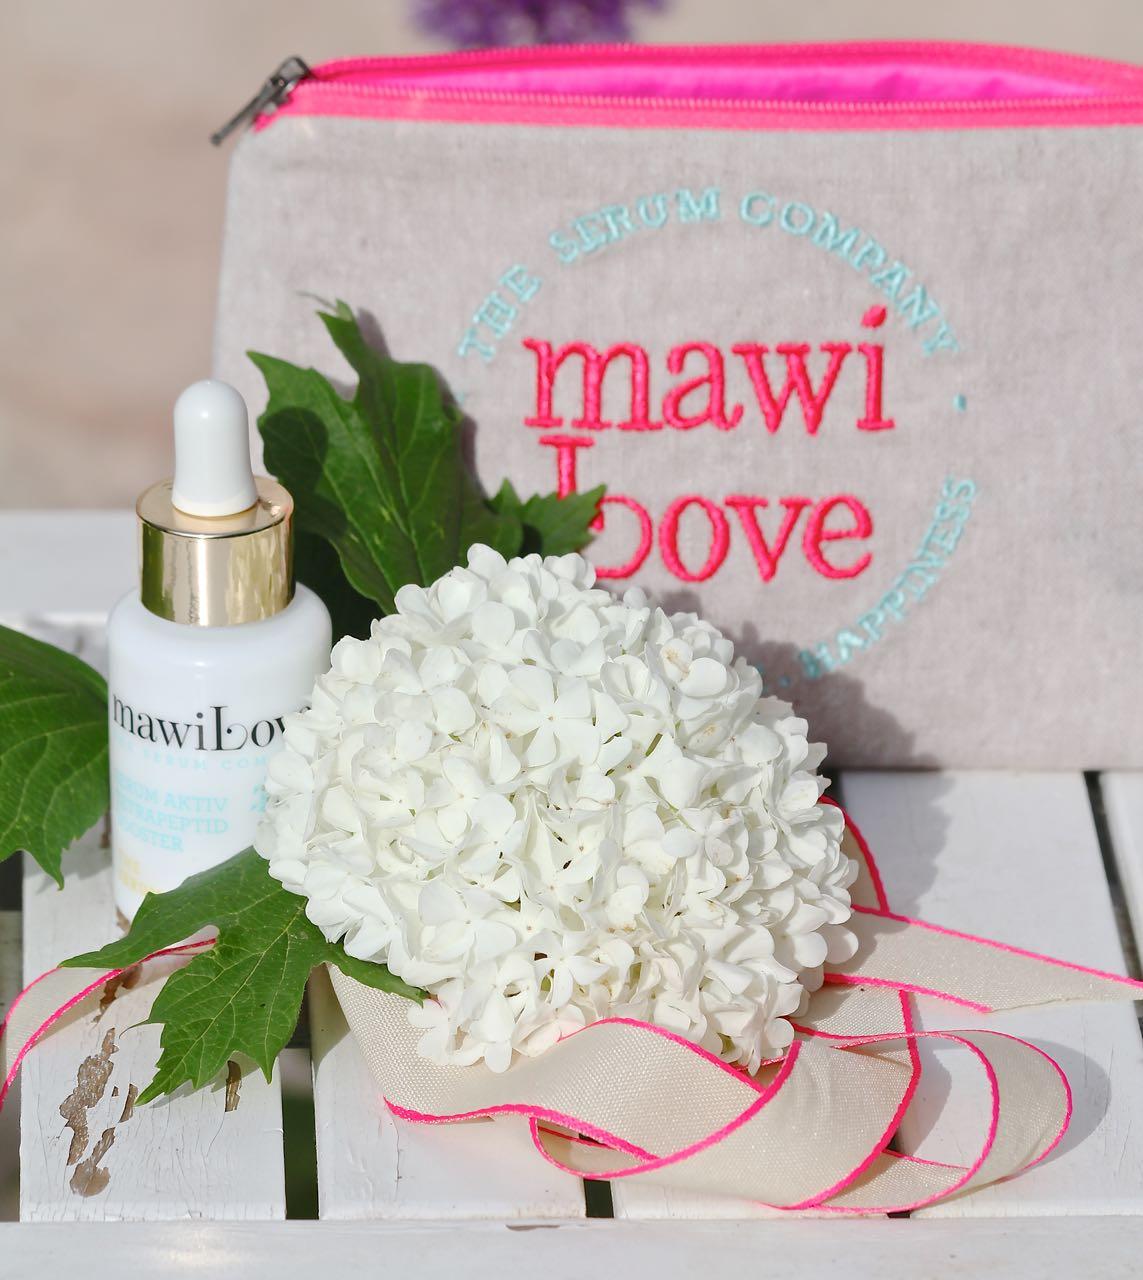 mawiLove serum 01 Labsalliebe 2